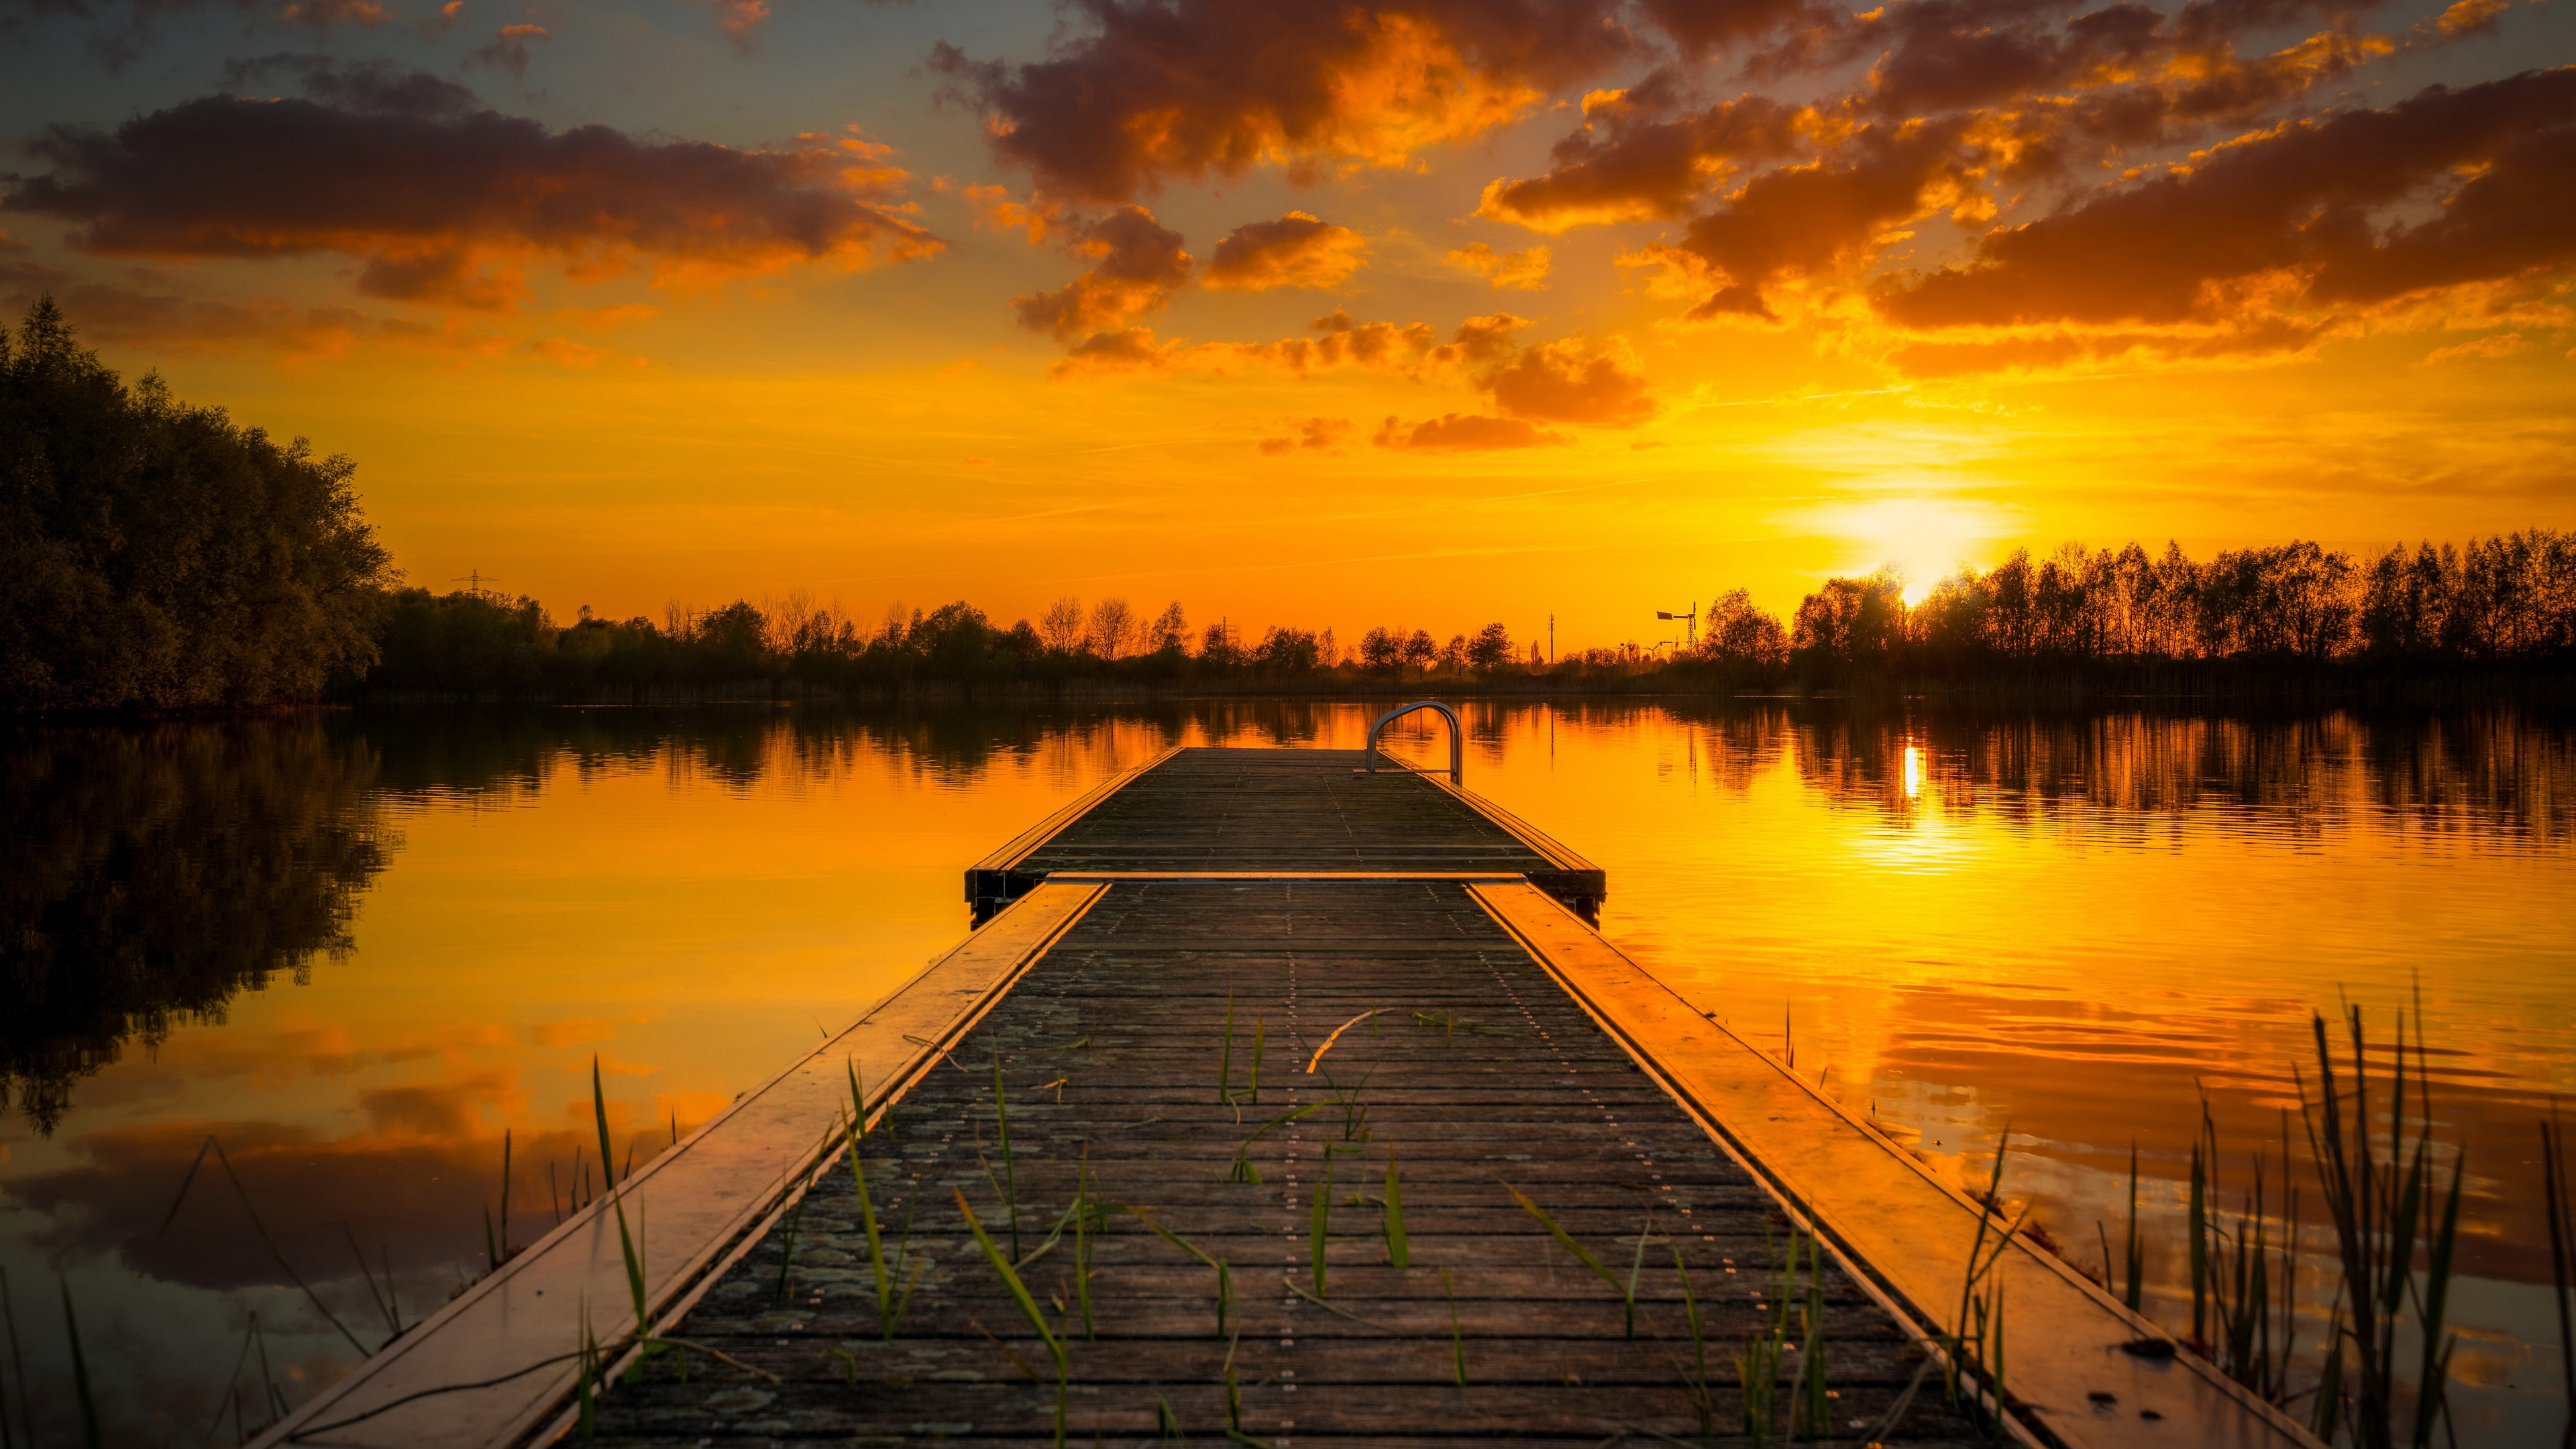 Багряно-желтый закат солнца